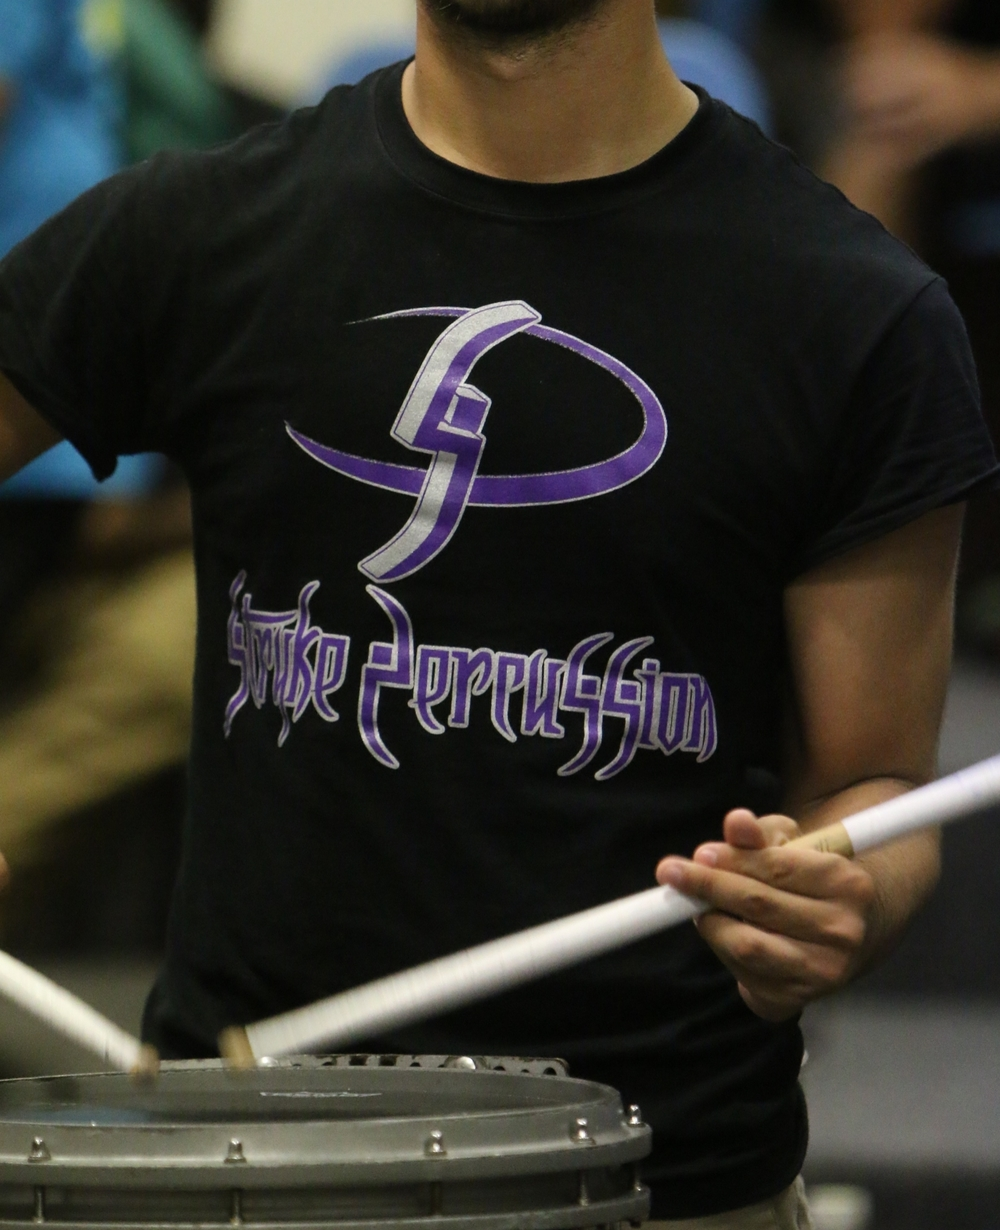 STRYKE Percussion T-Shirt